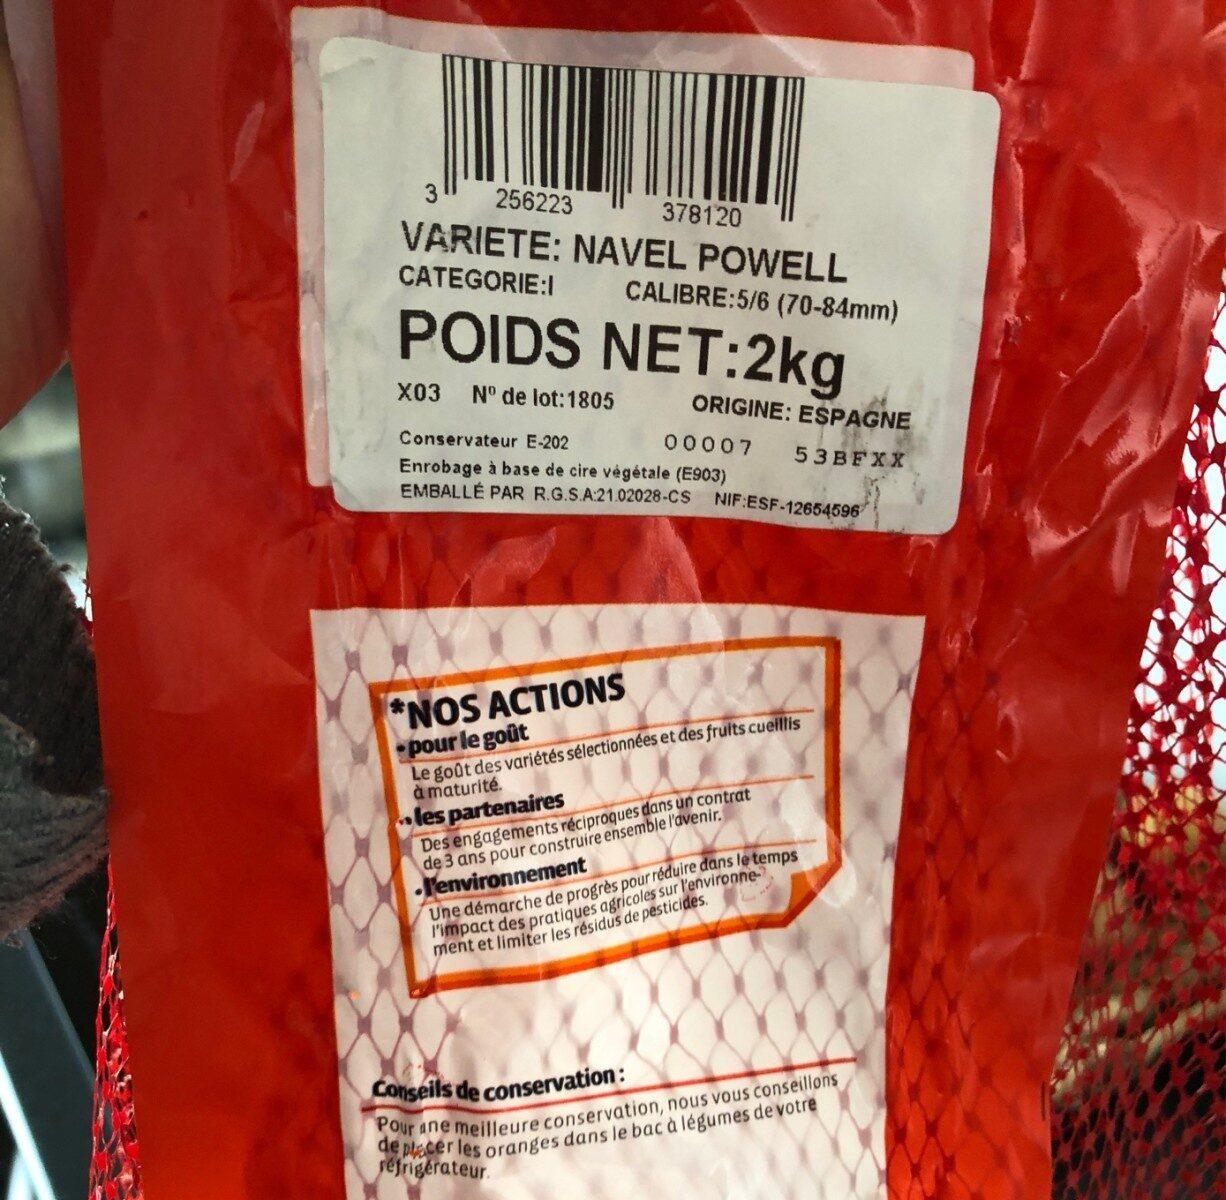 Orange à dessert Navel Powell, calibre 5/6 catégorie 1 - Ingredients